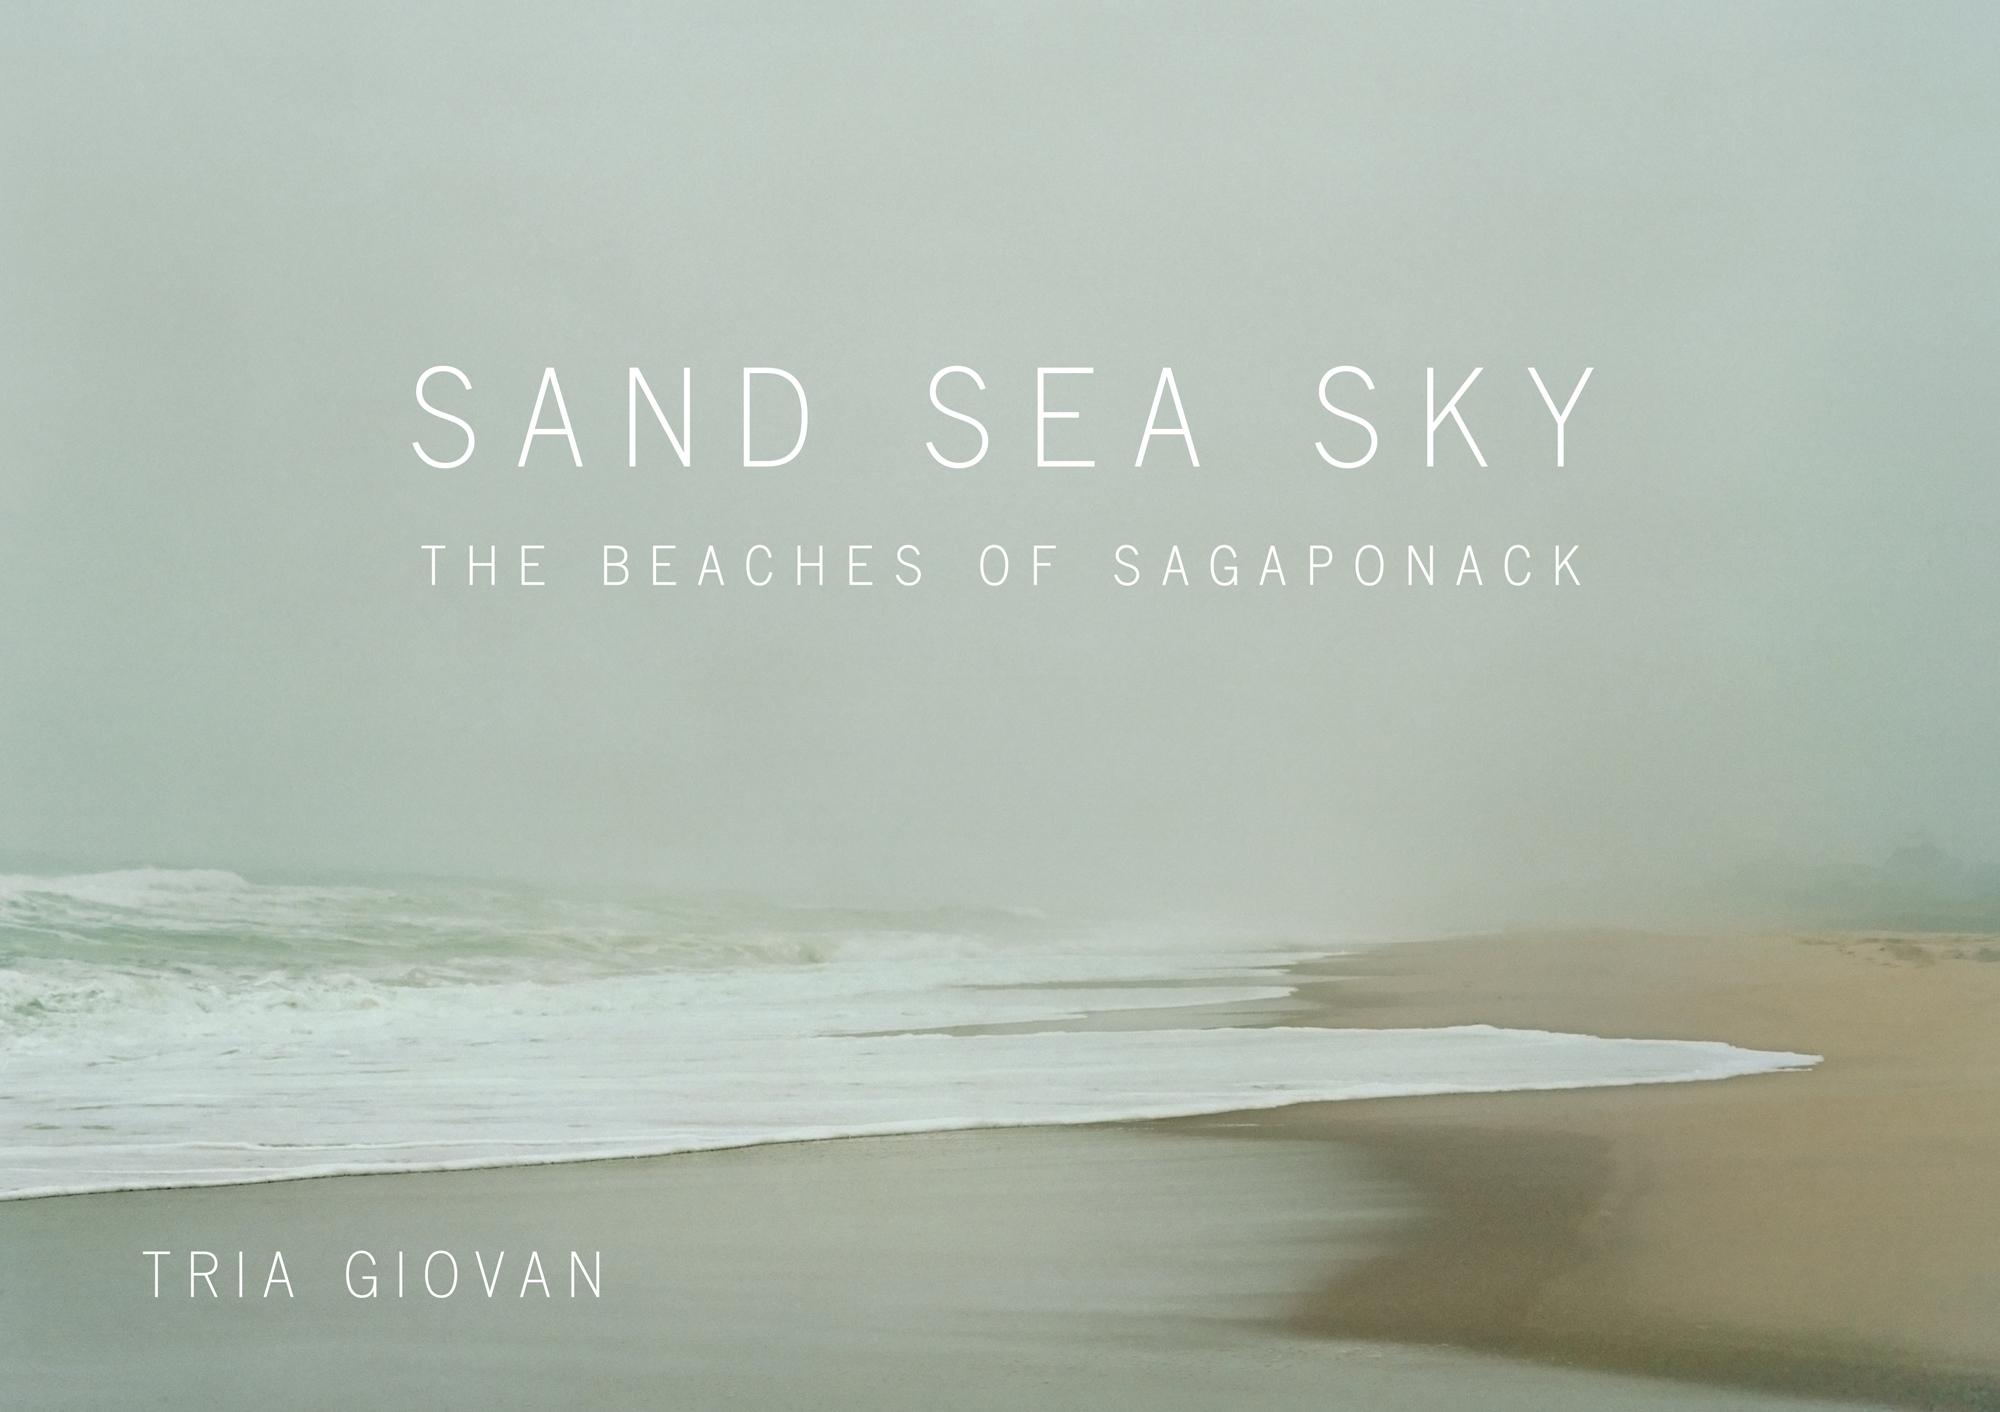 Sand_Sea_Sky_cover_w2000px.jpg